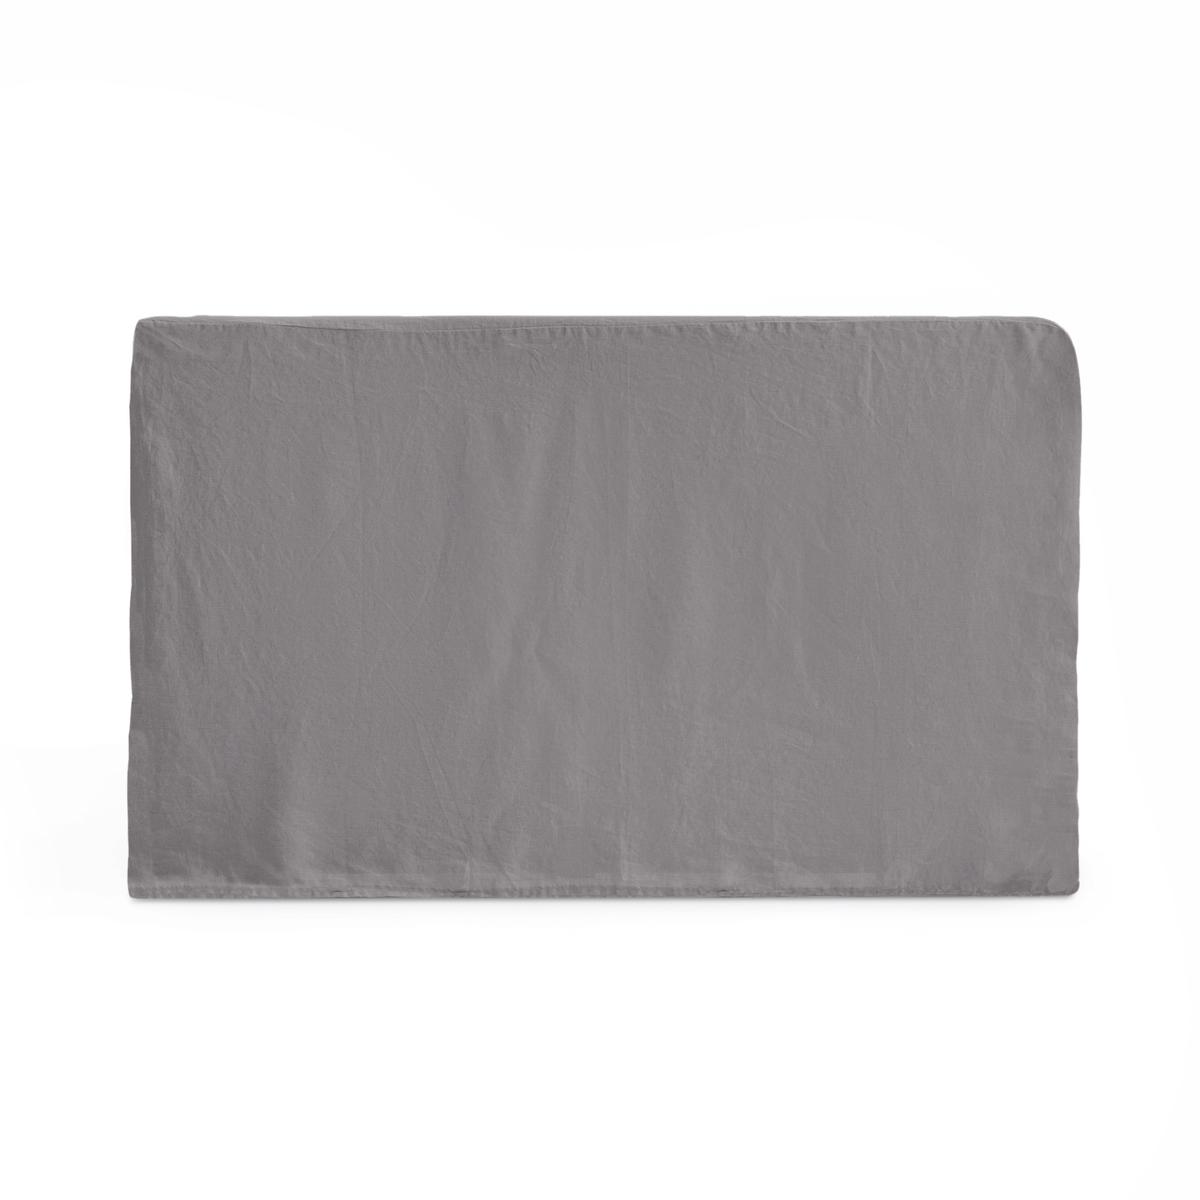 Чехол LaRedoute На изголовье кровати из стиранного льна Abella 140 x 85 см серый